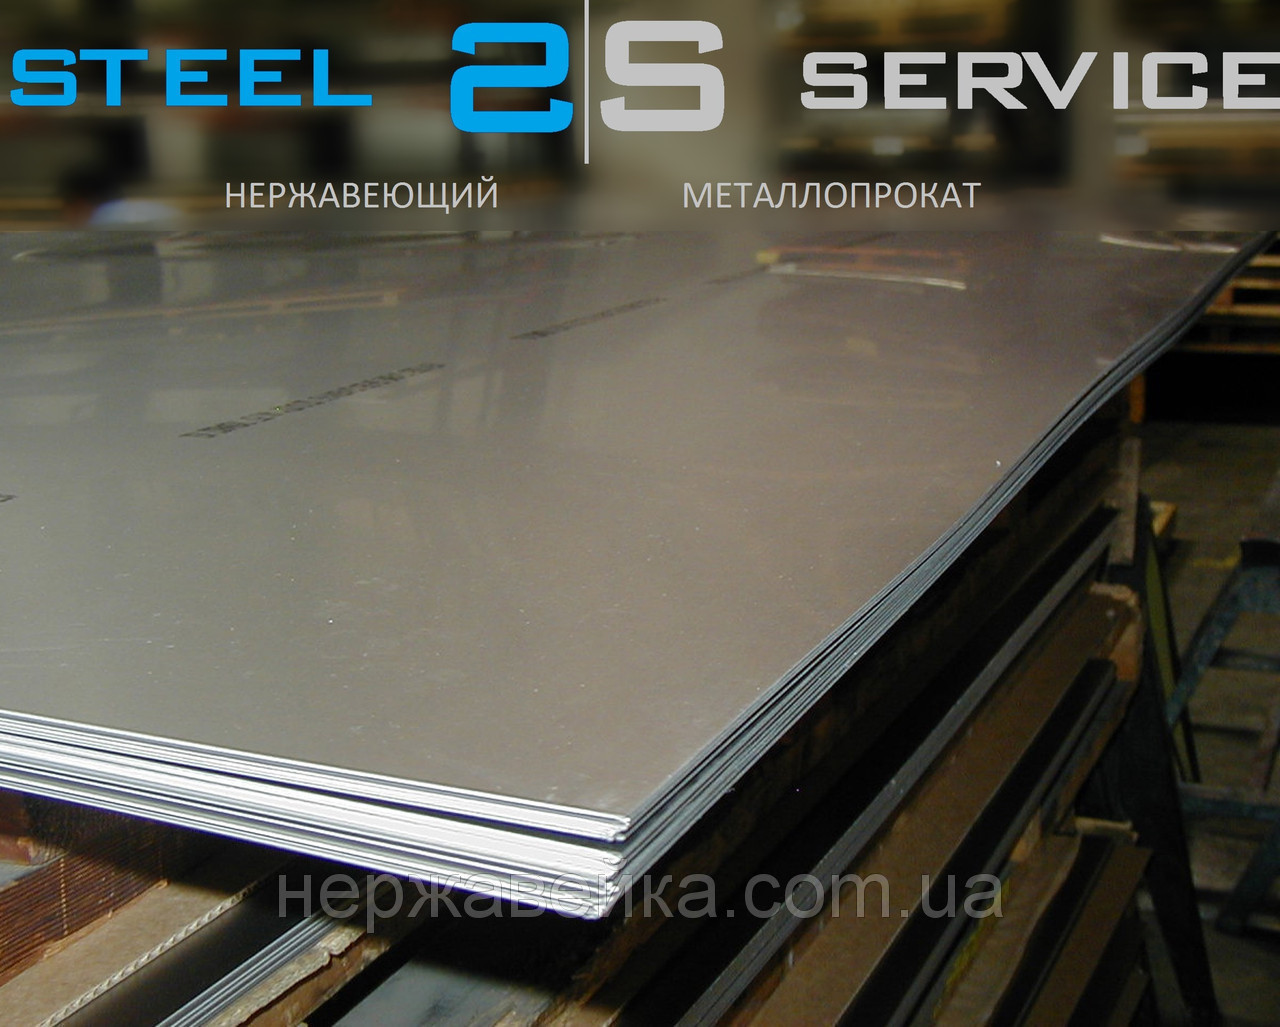 Нержавейка лист 6х1000х2000мм  AISI 316Ti(10Х17Н13М2Т) F1 - горячекатанный,  кислотостойкий